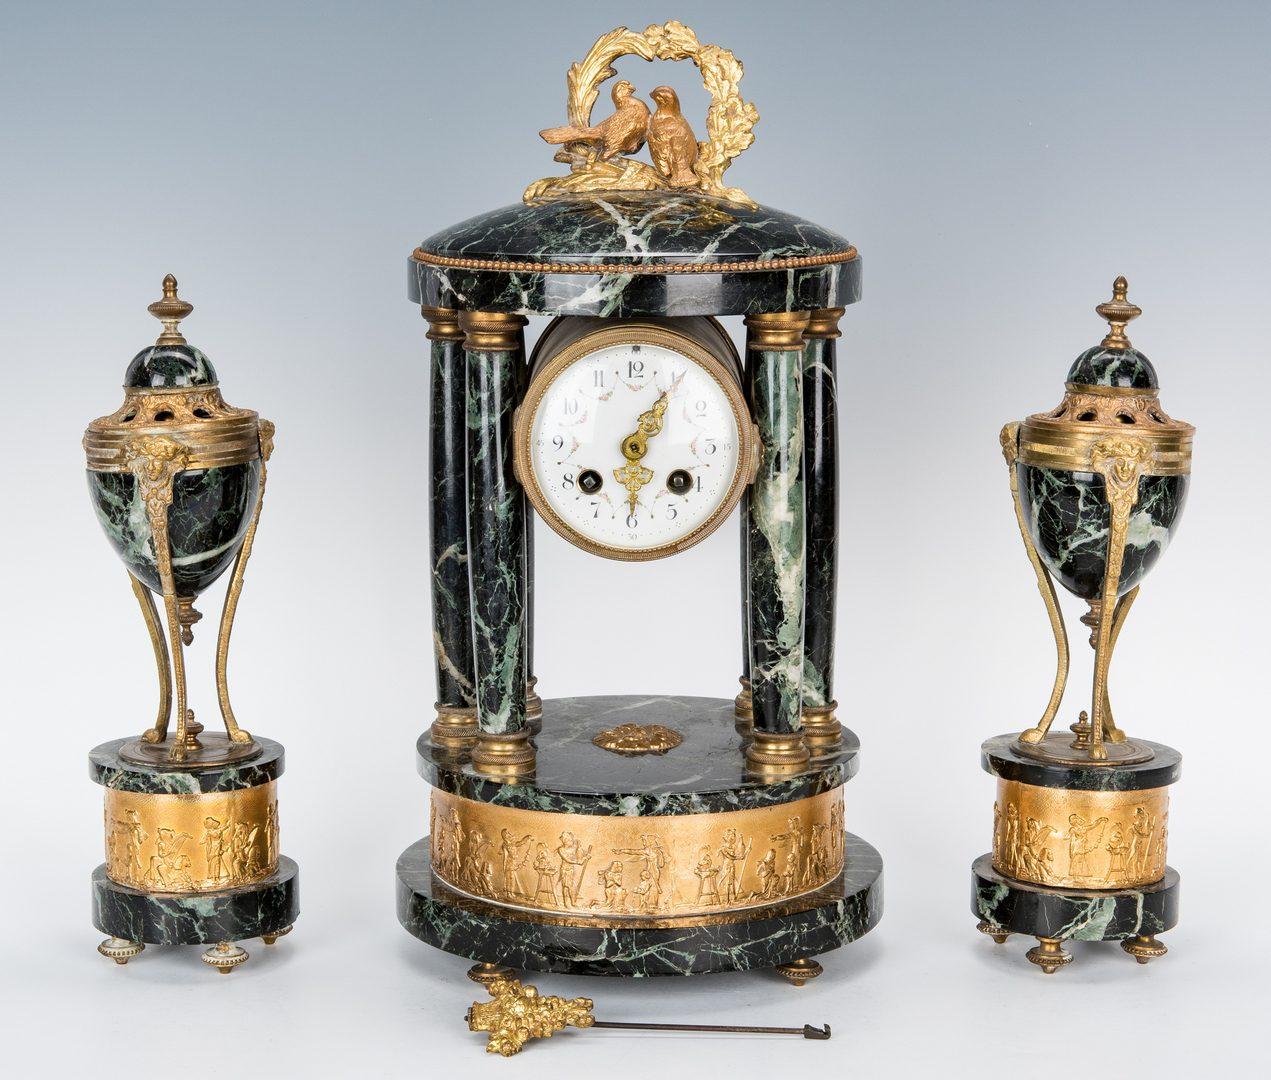 Lot 272: 3-piece French Marble Clock Garniture Set